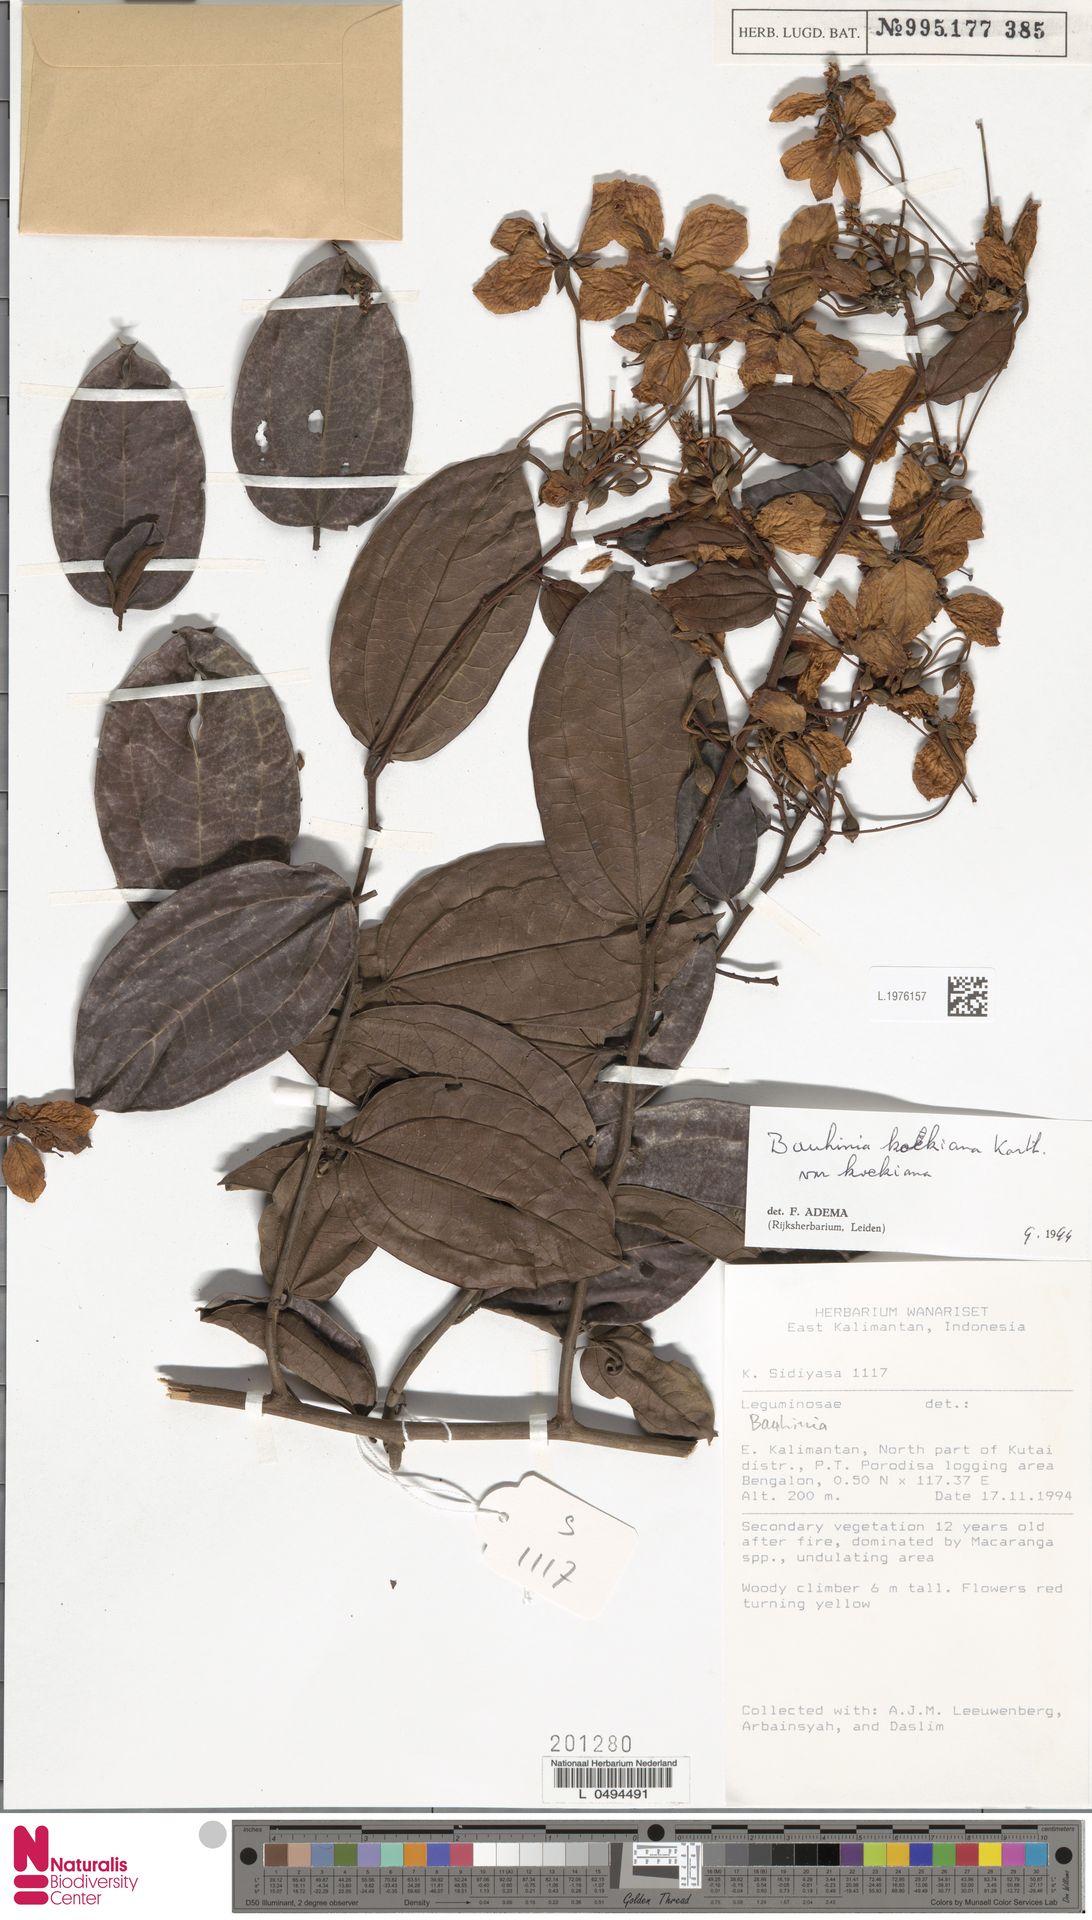 L.1976157 | Bauhinia kockiana var. kockiana